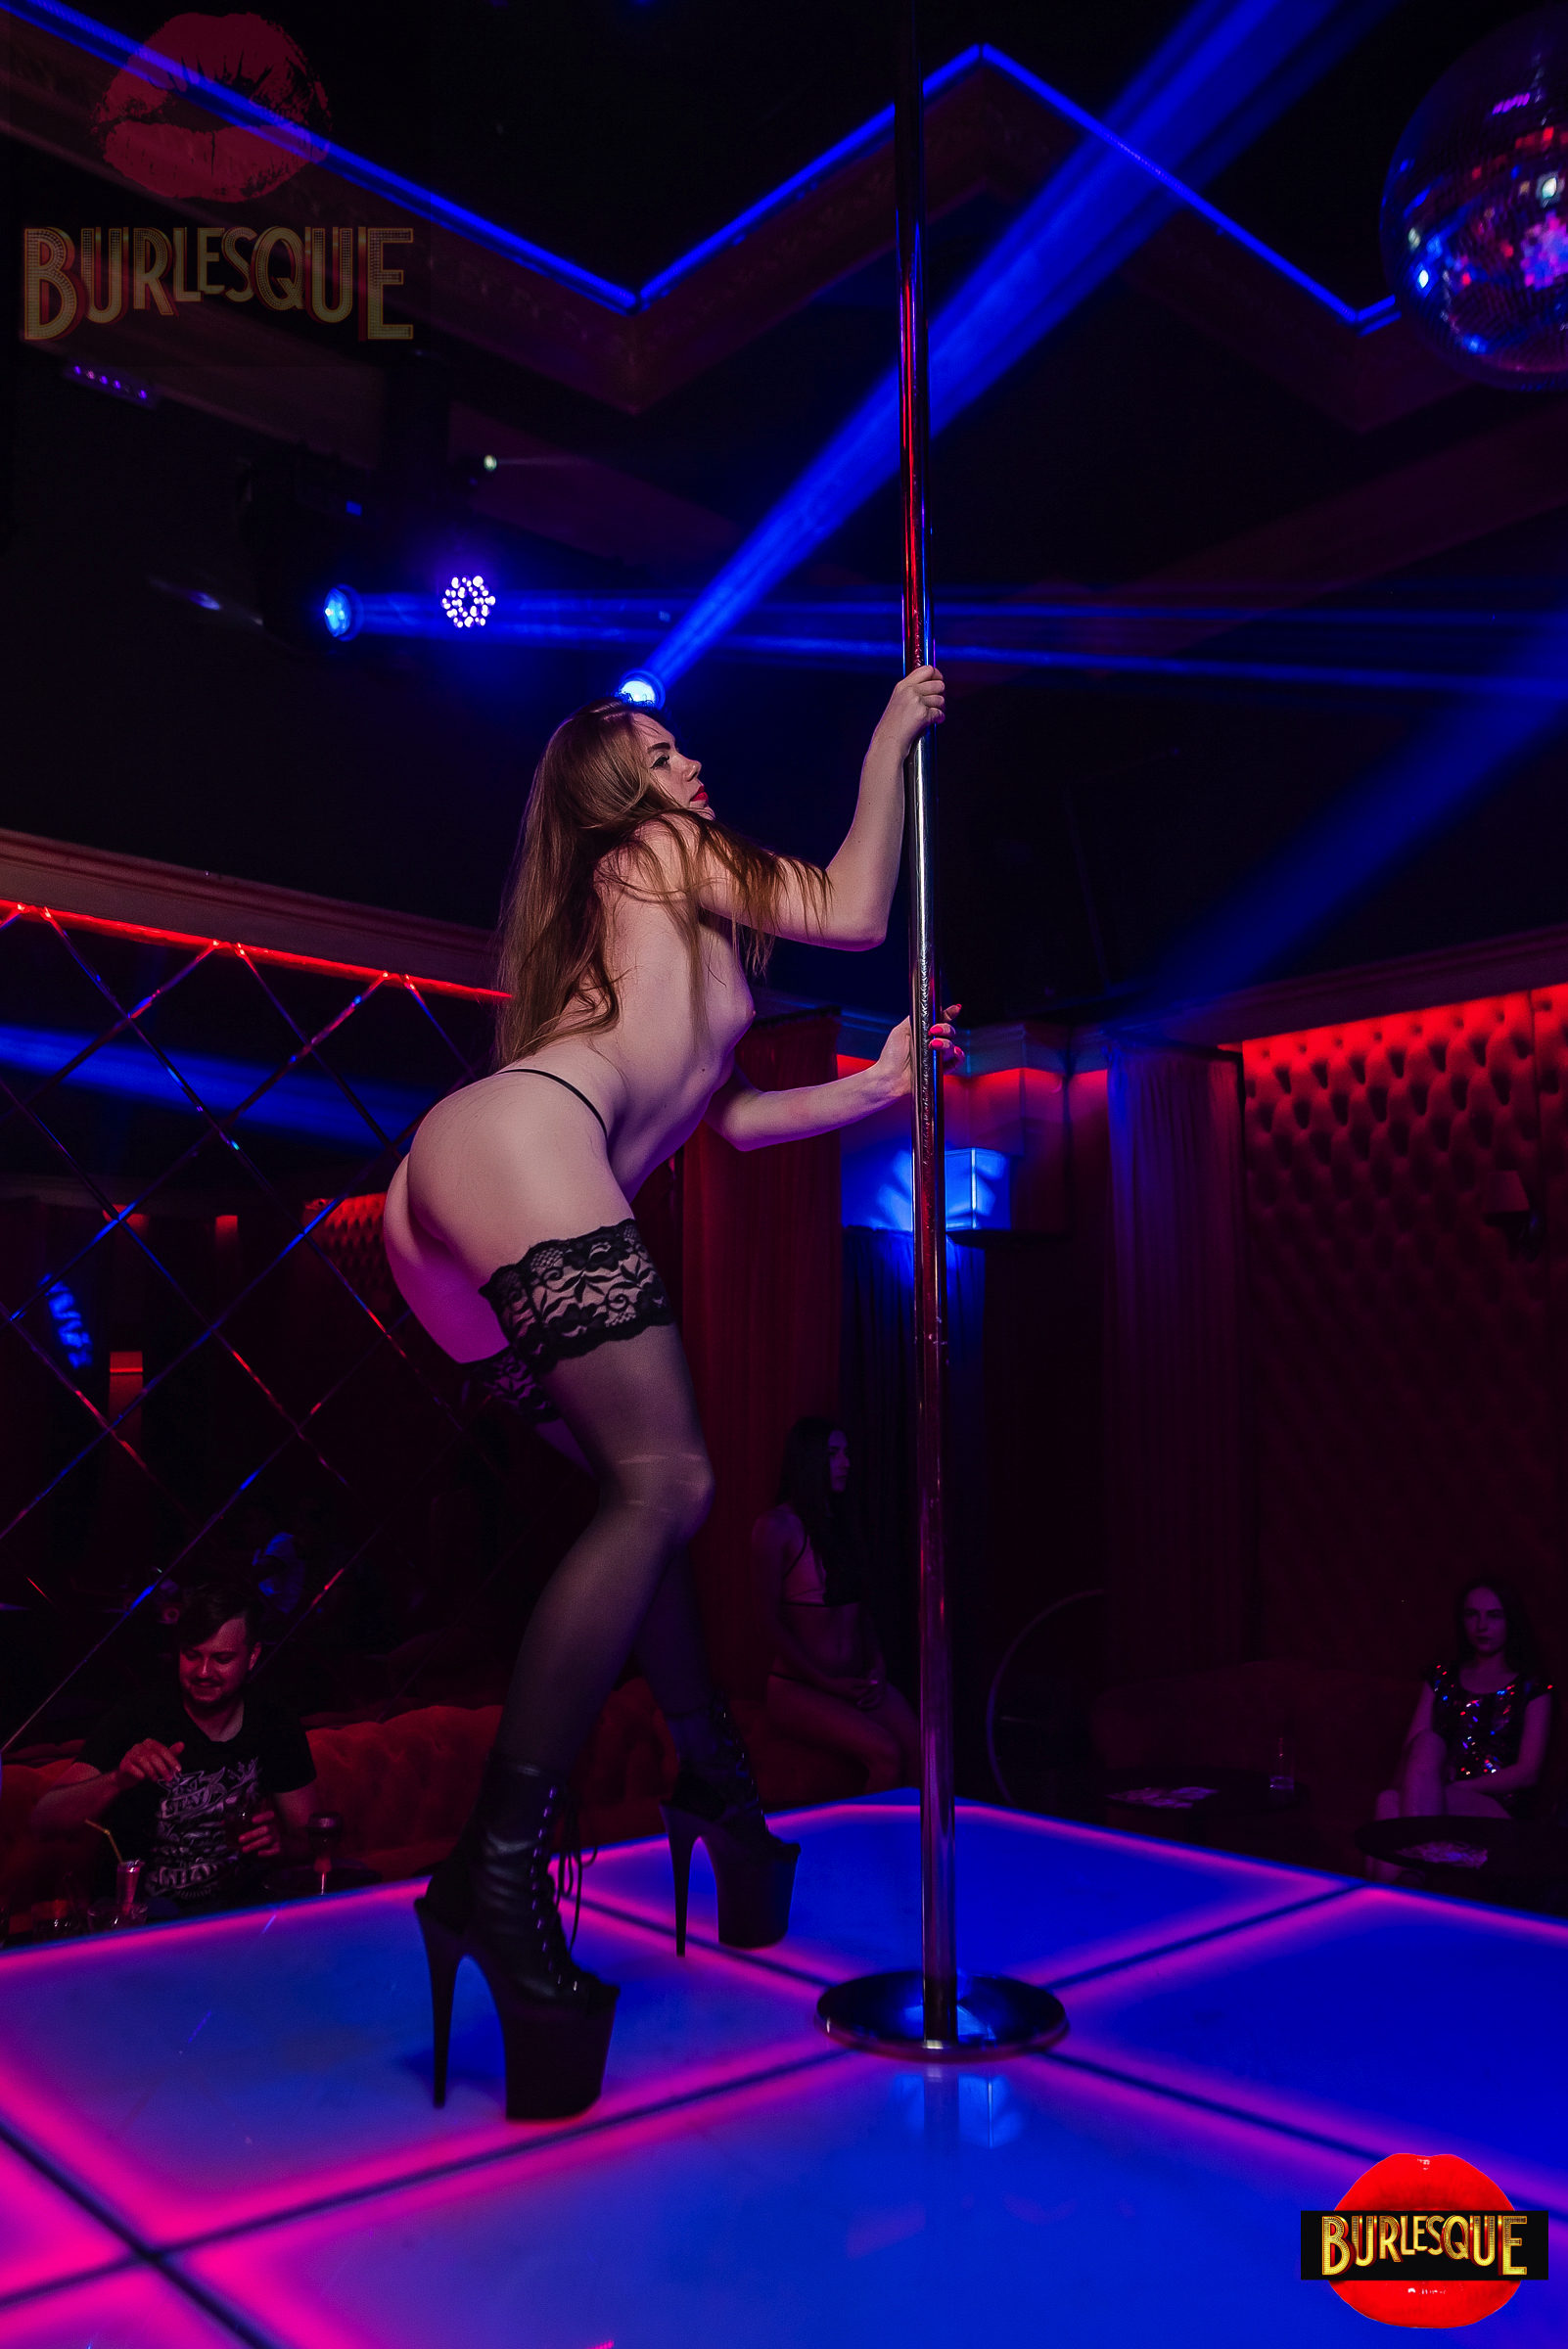 Strip club in heratige missouri